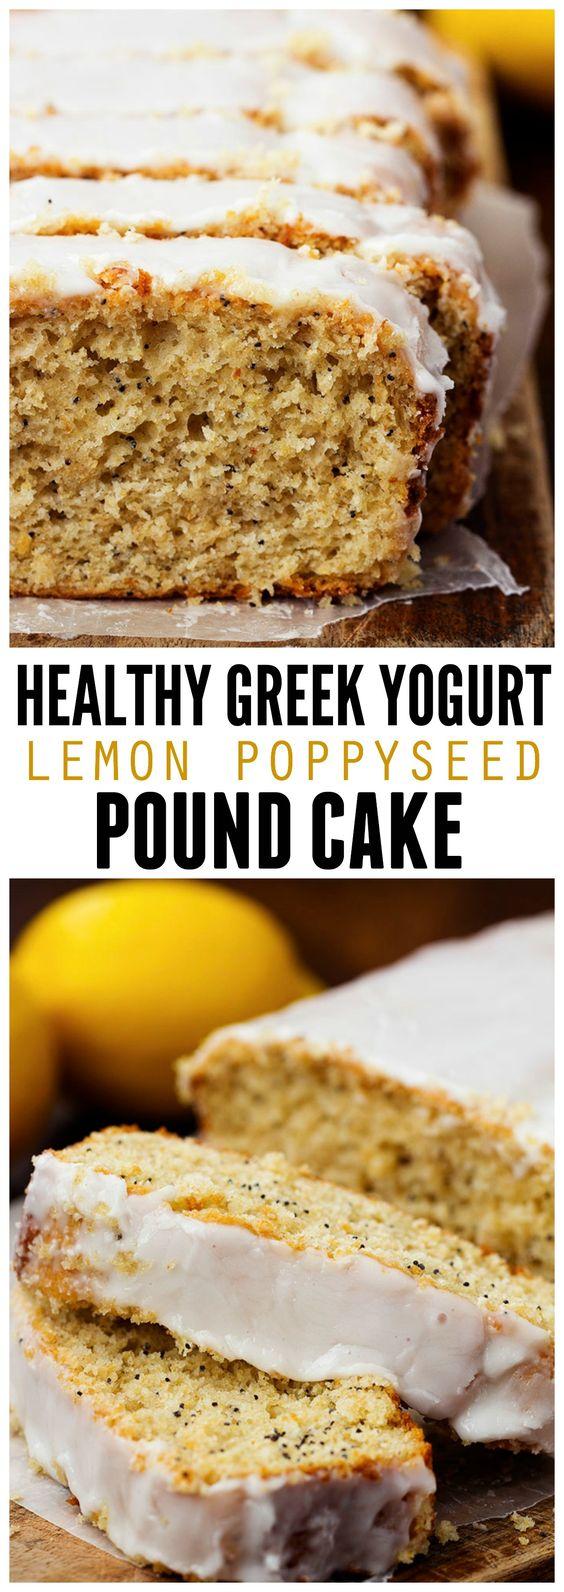 Healthy Greek Yogurt Lemon Poppyseed Pound Cake | Recipe ...